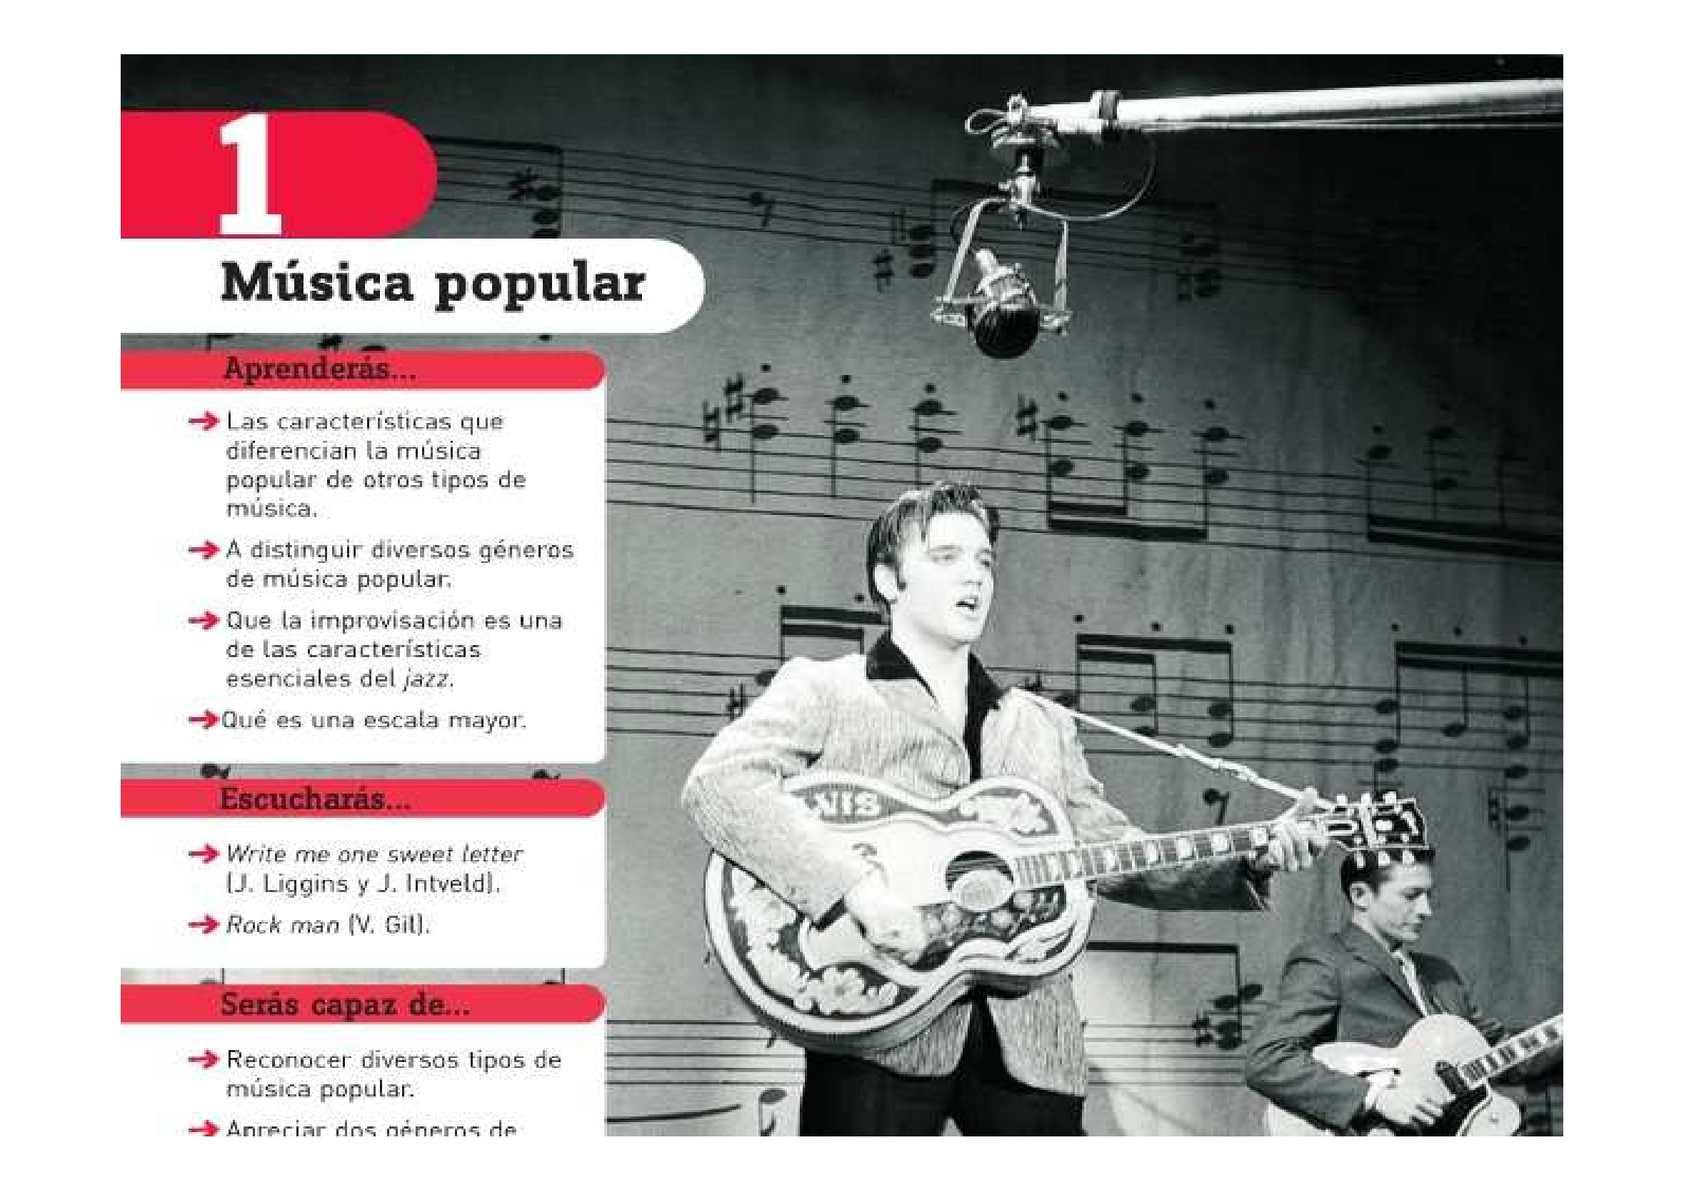 ListadoFarraoke7200Temas | Música popular | Músicos